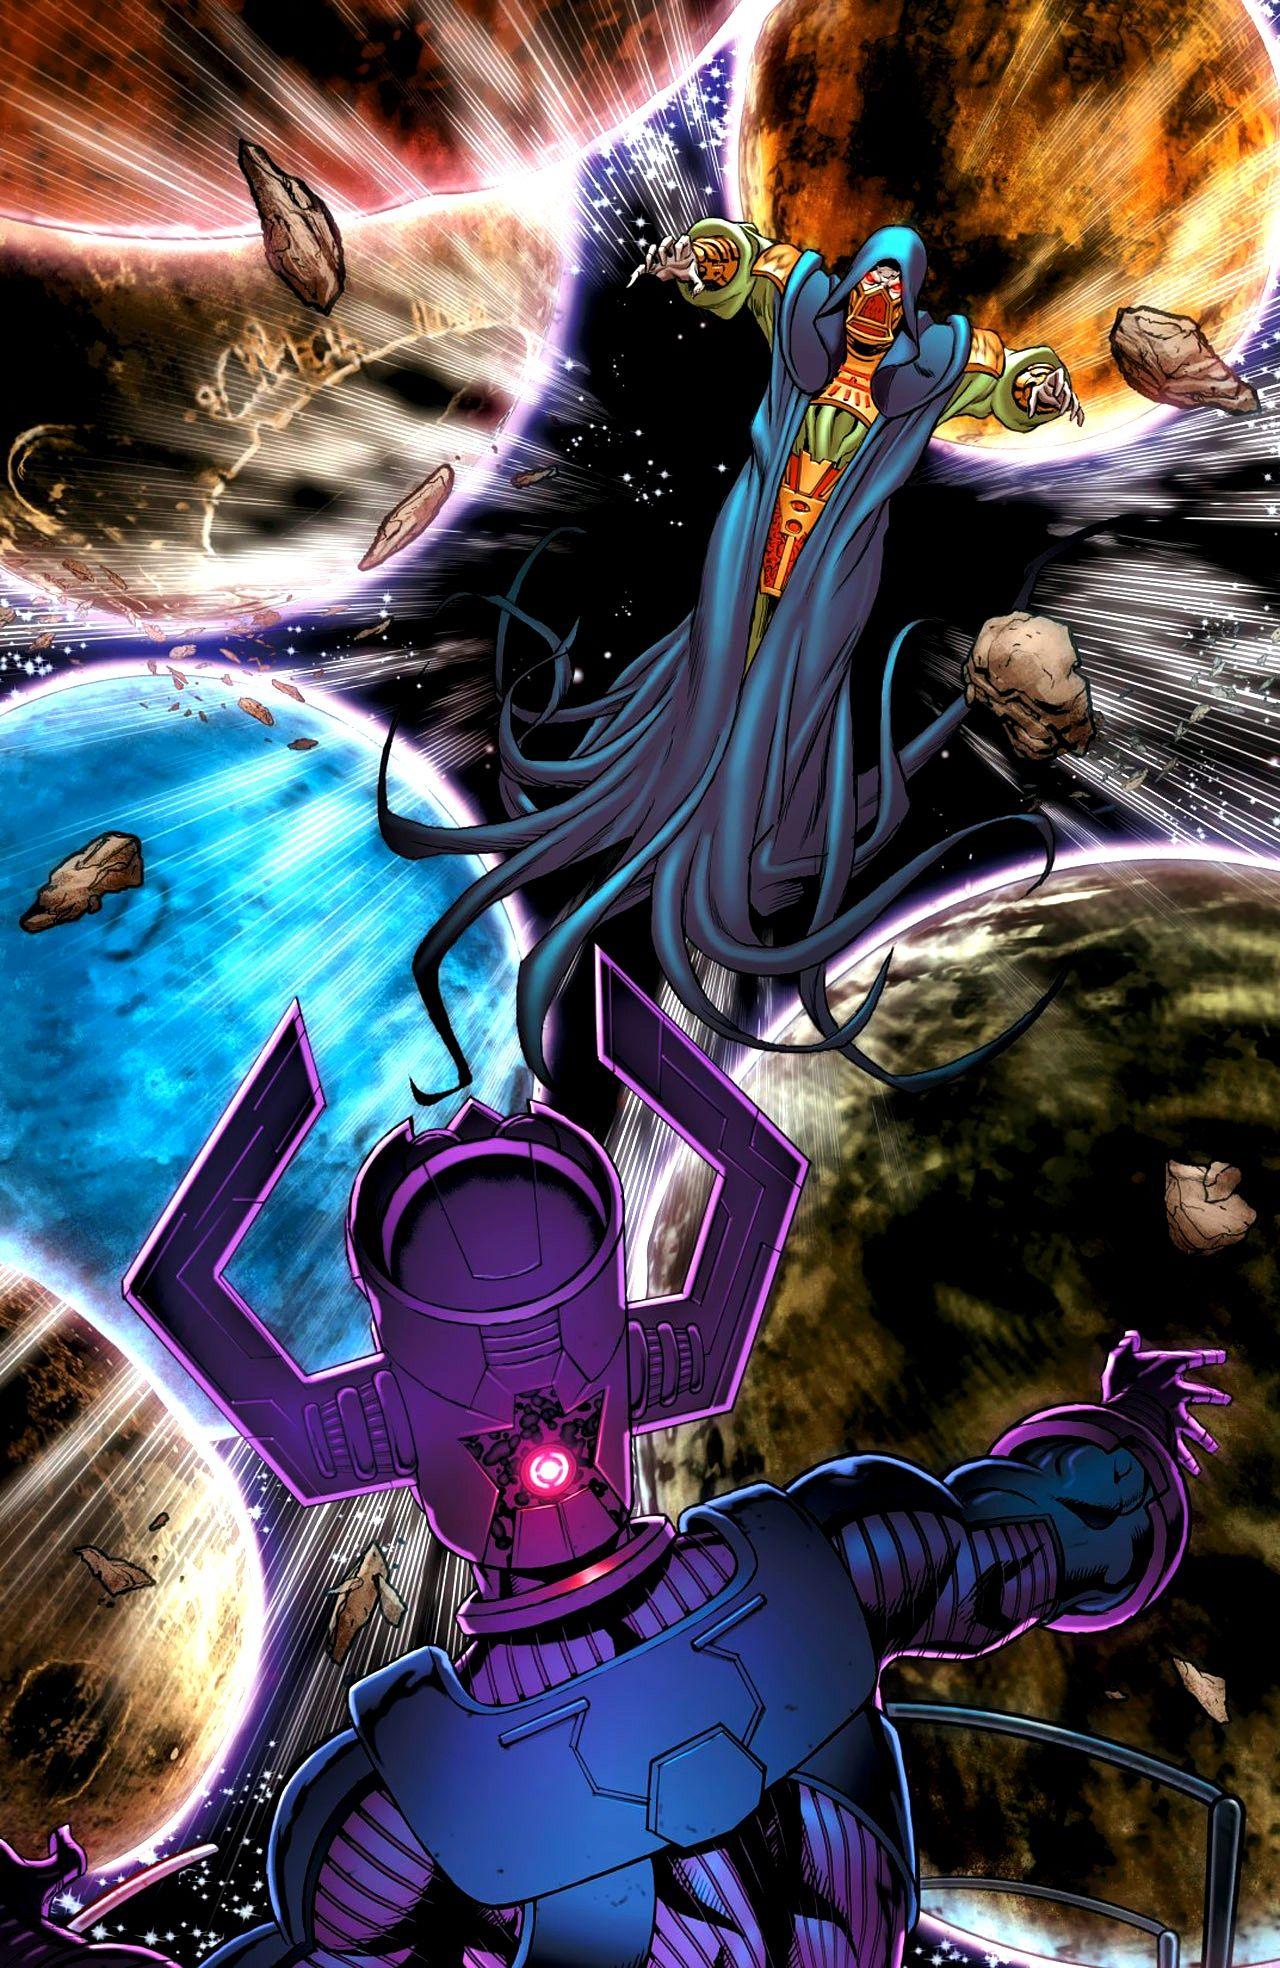 galactus vs thanos - photo #19